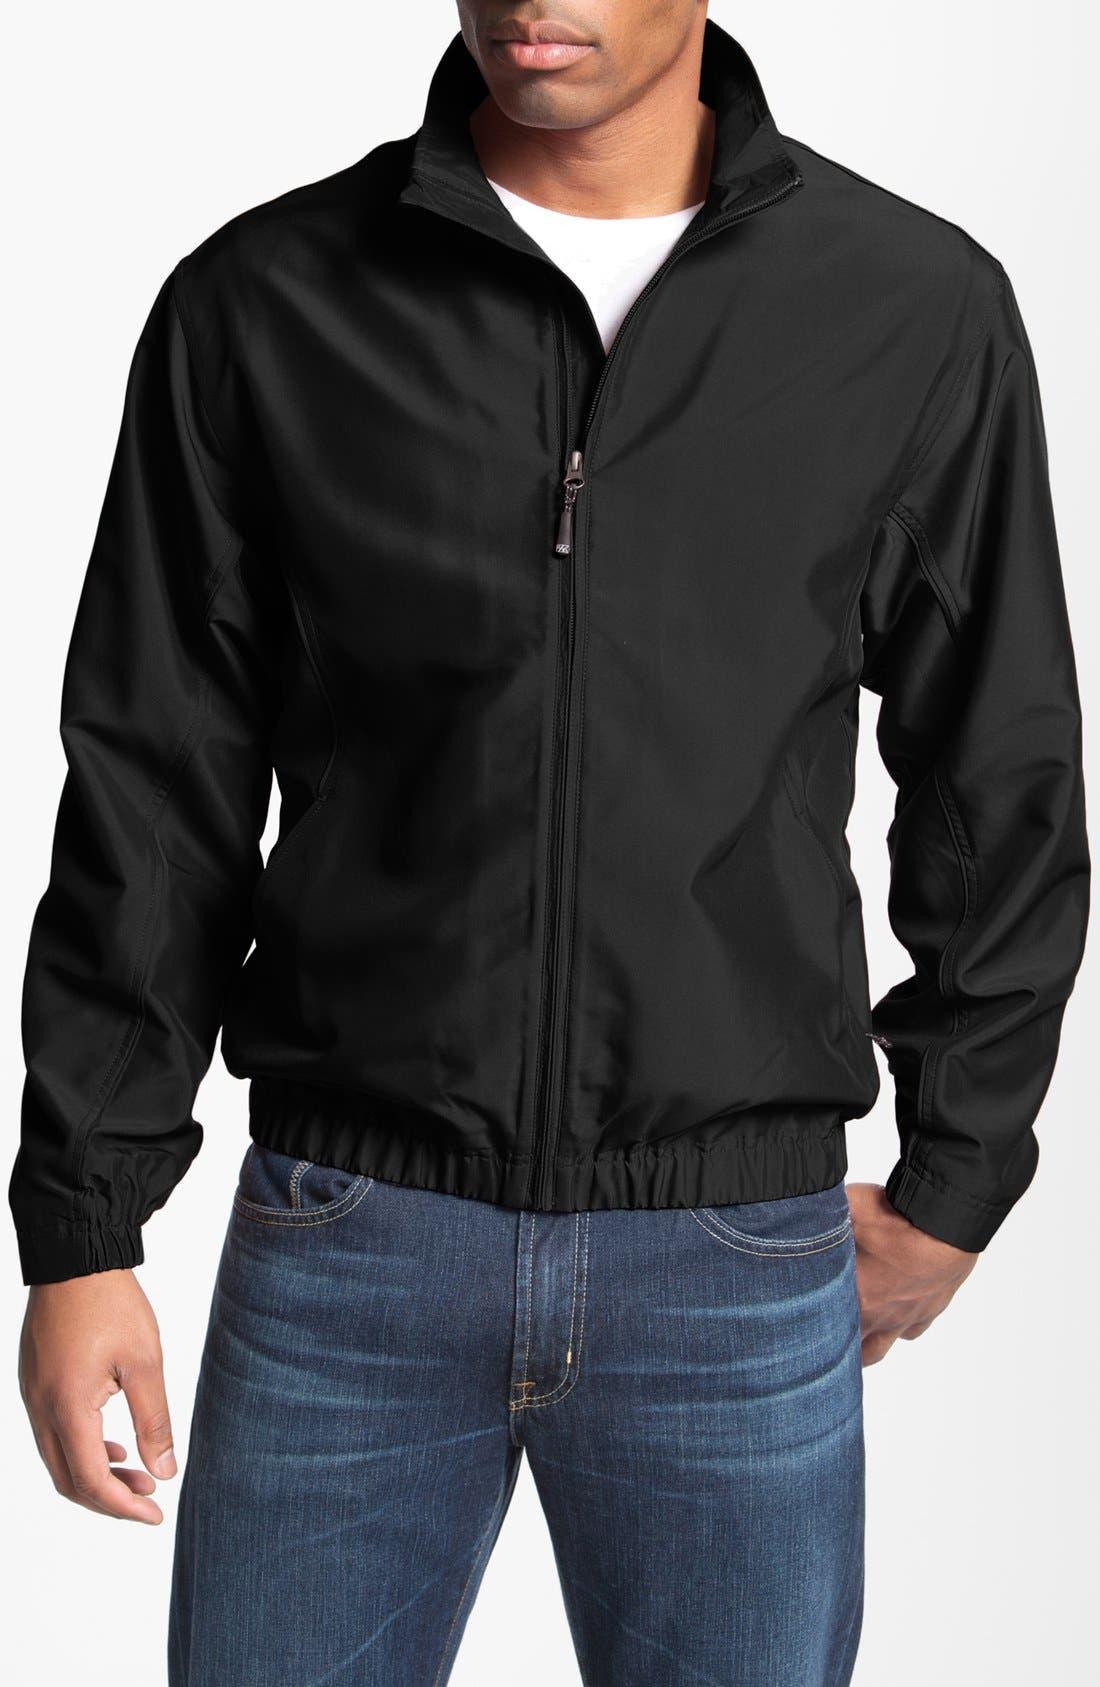 Alternate Image 1 Selected - Cutter & Buck 'Astute' Windbreaker Jacket (Online Only)